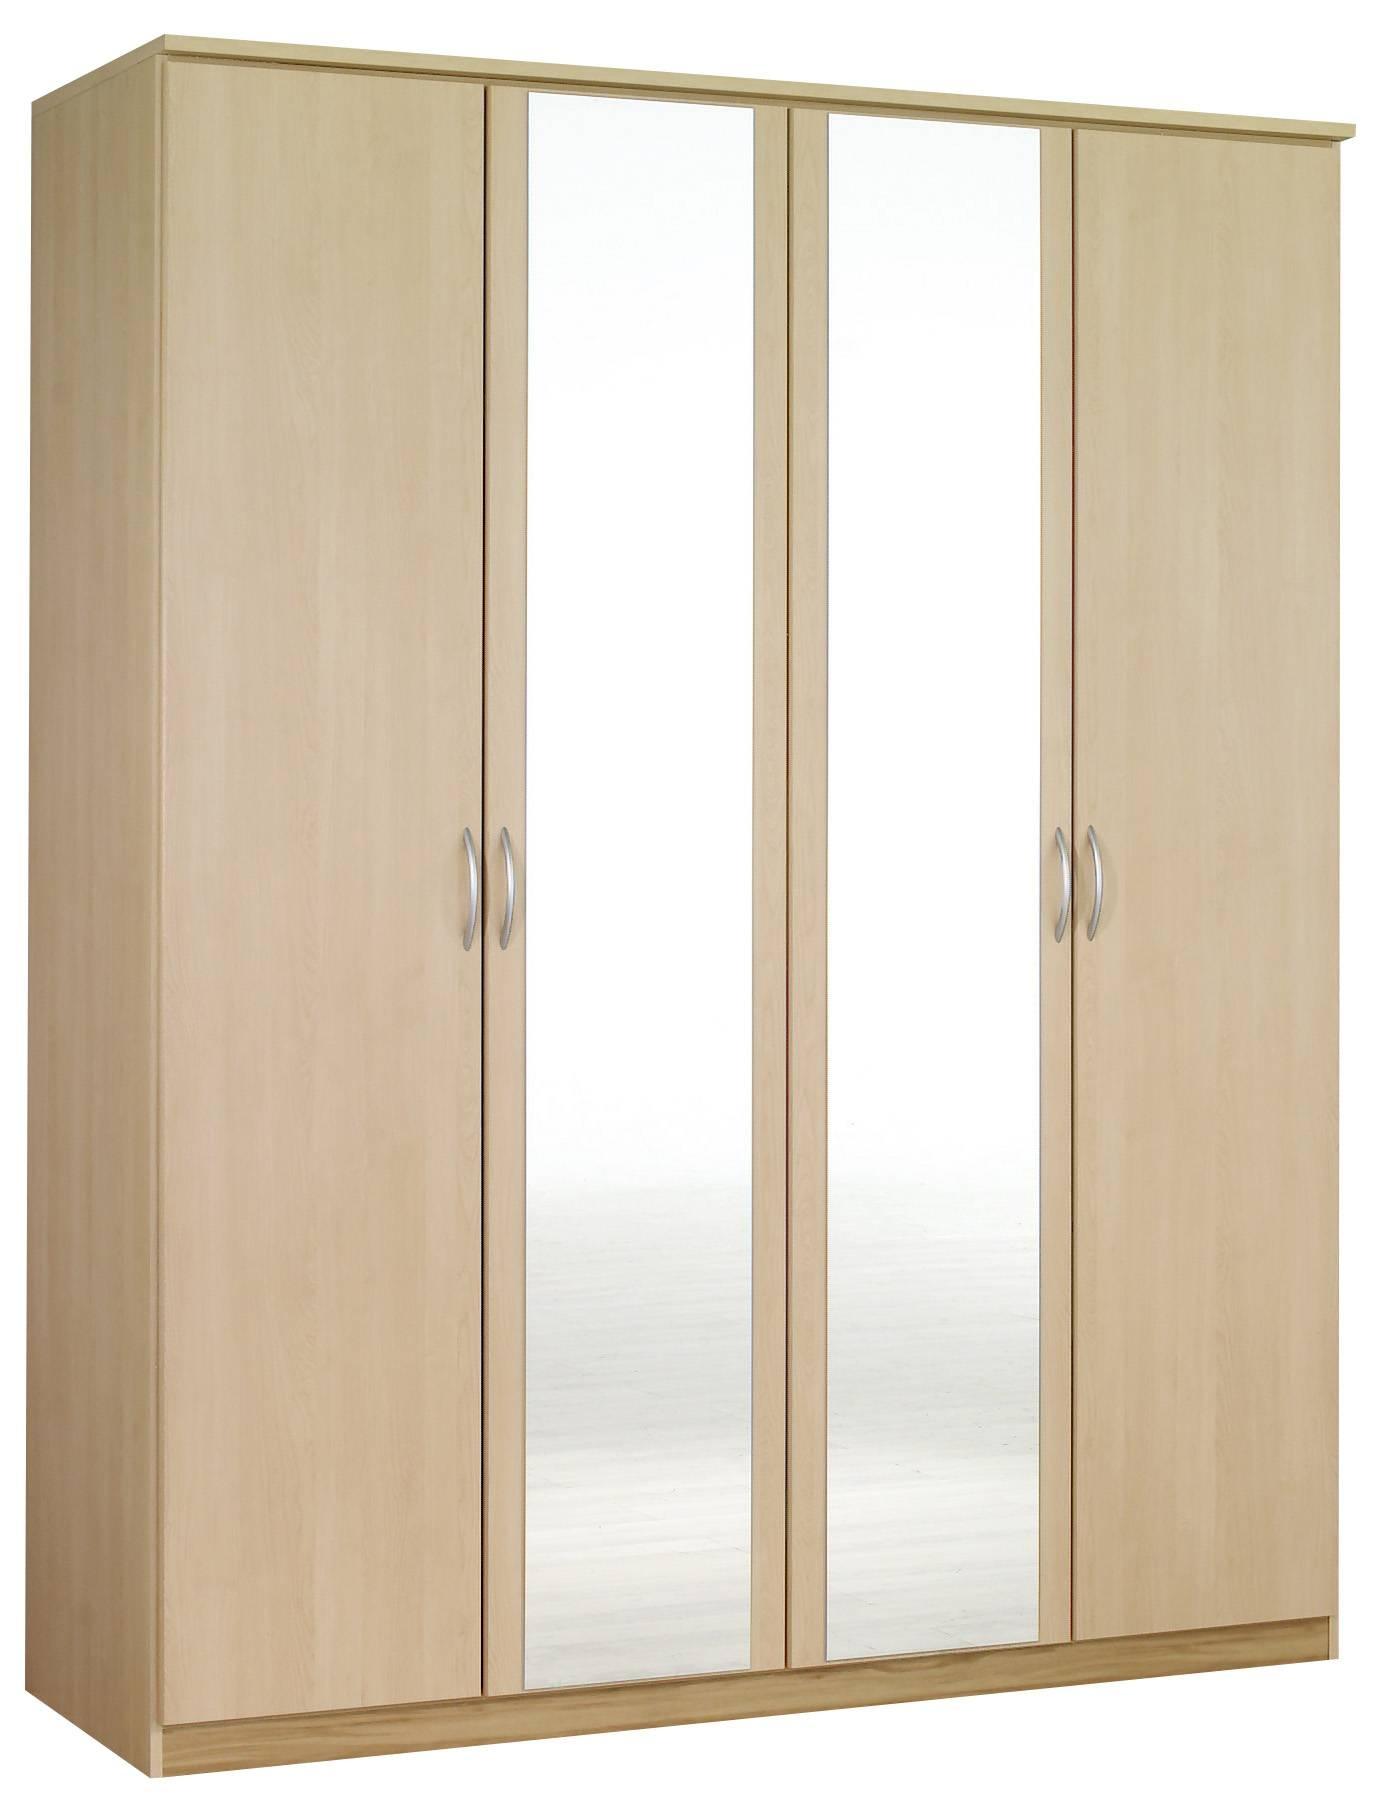 Wardrobes – Bedroom Furniture – Bedroom Intended For Kent Wardrobes (View 7 of 15)